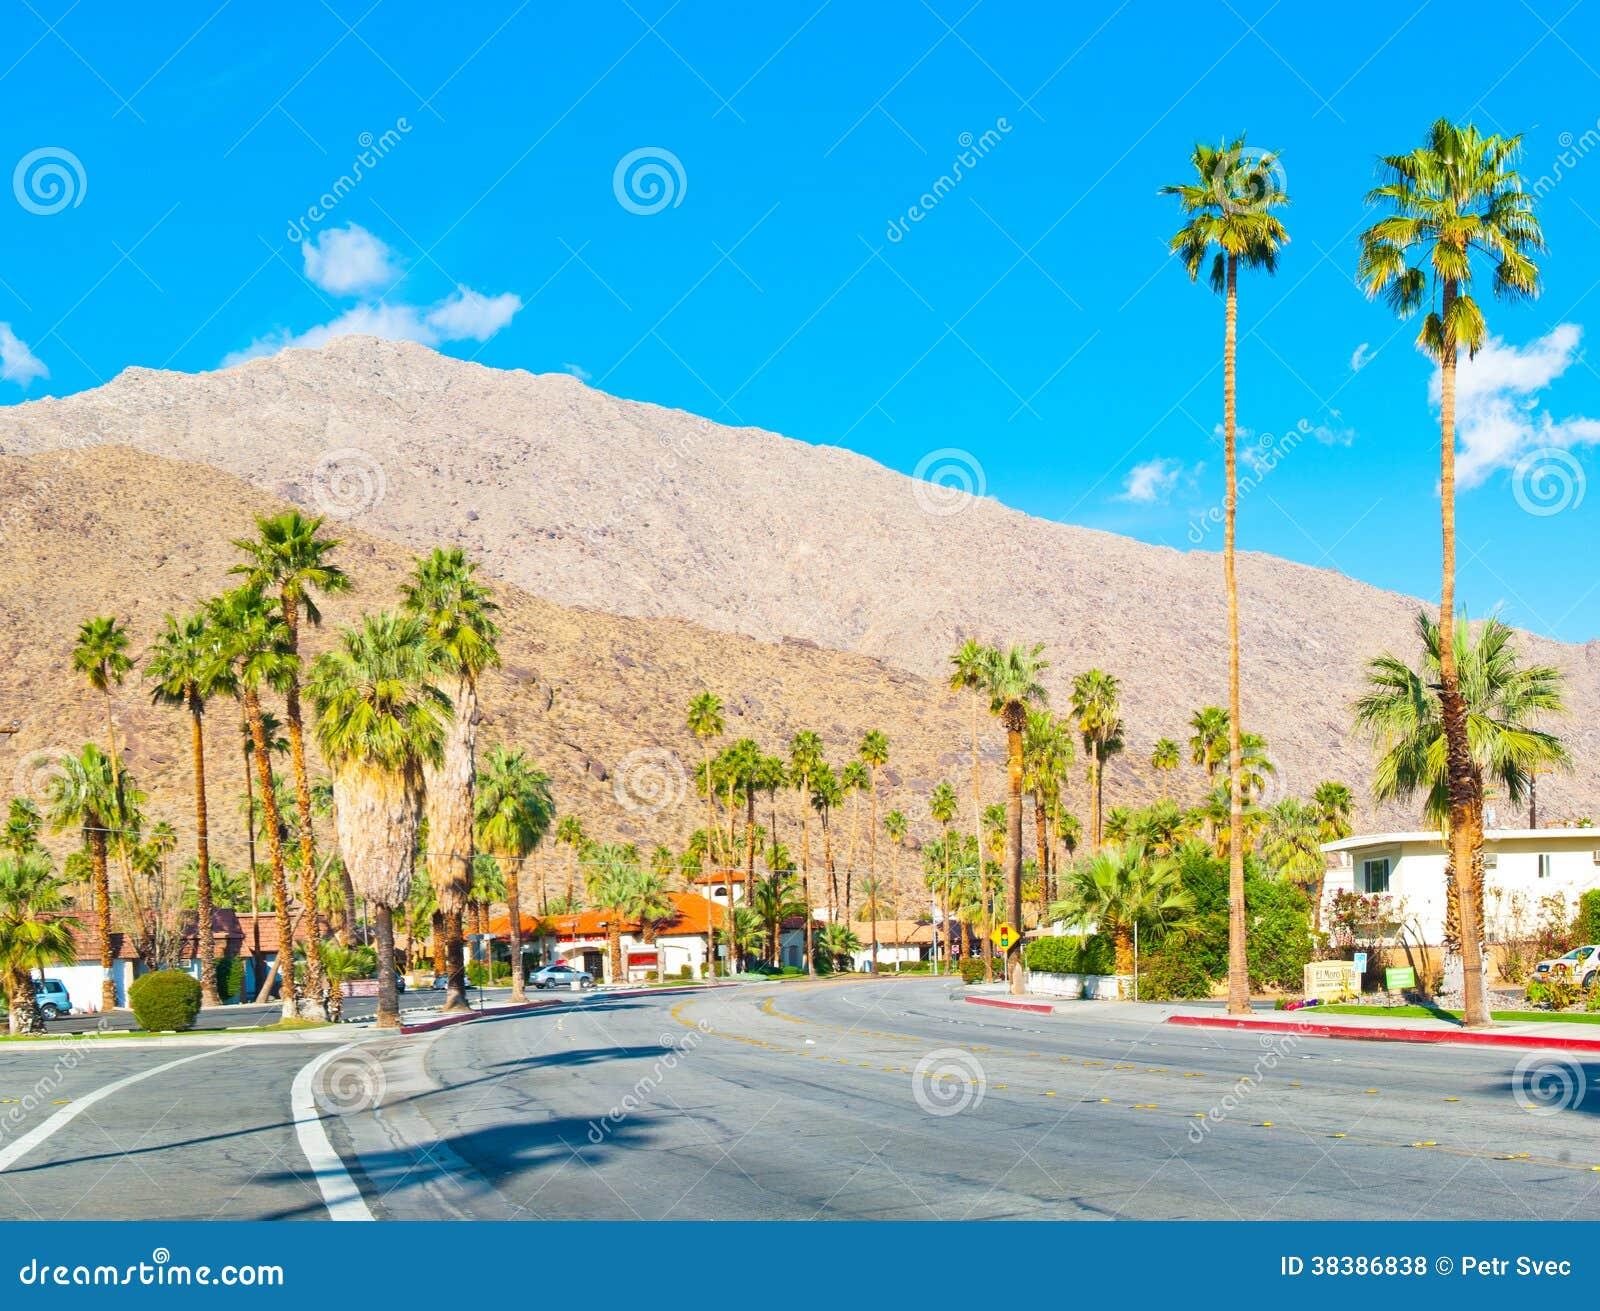 Droga w palm springs